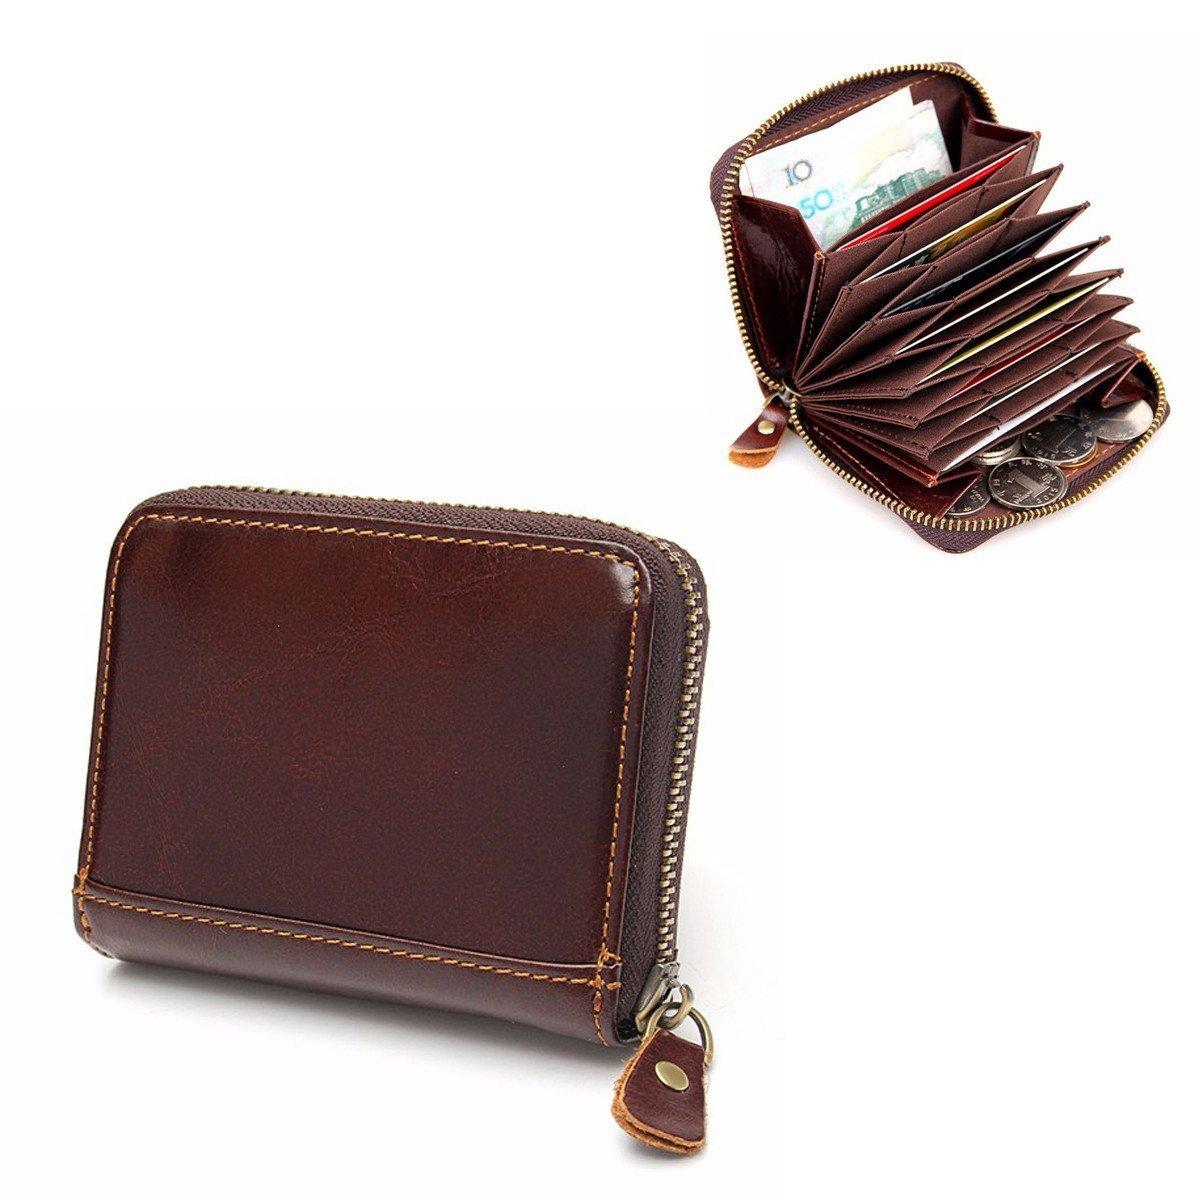 DAVITU RFID Blocking Coffee Leather Zipper Business Card Around Wallet Card Holder Coin Purse - Stationery Supplies - Binders & Folders